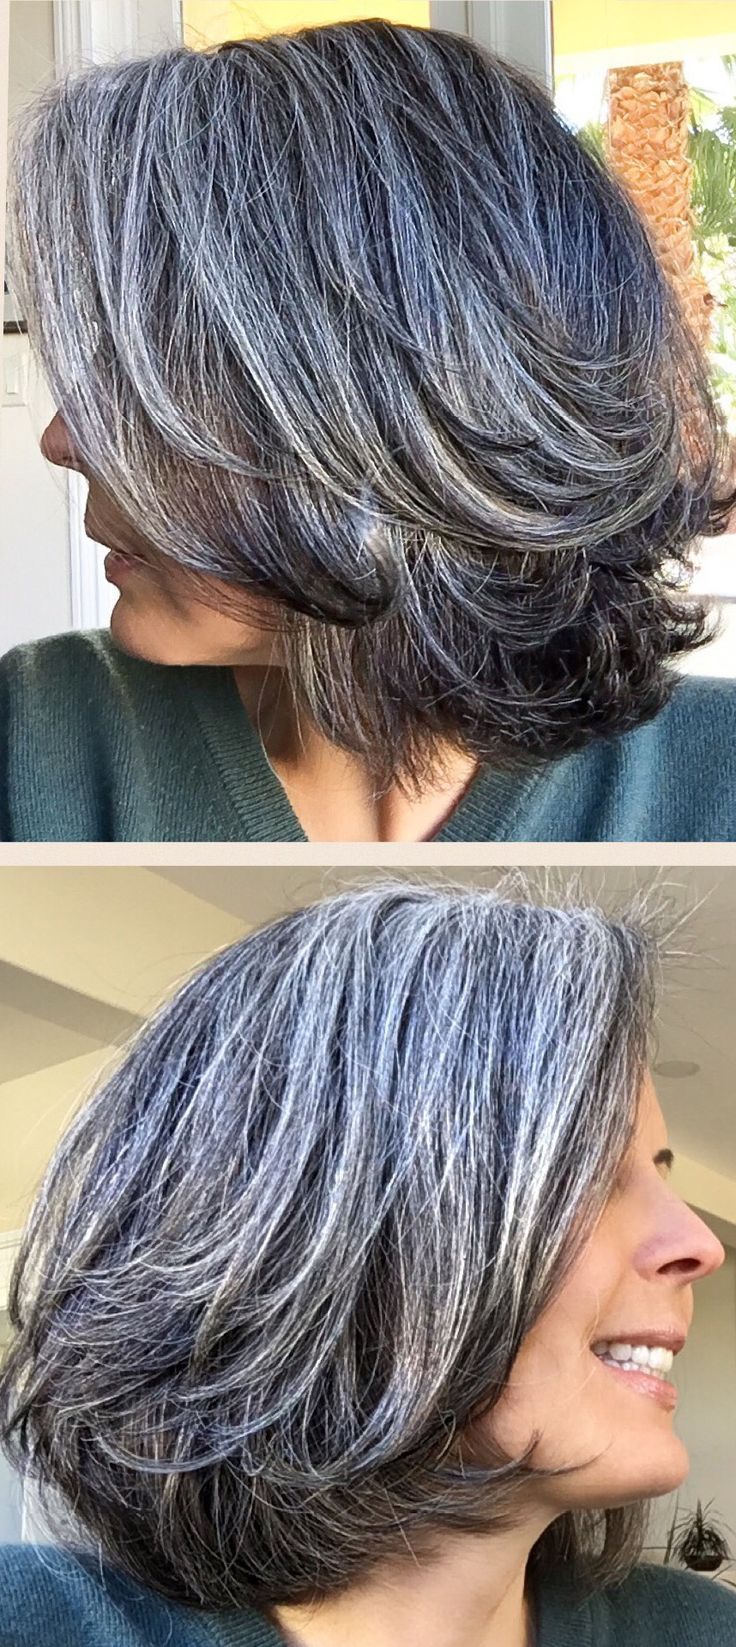 Best 20+ Silver hair colors ideas on Pinterest | Ash gray ...